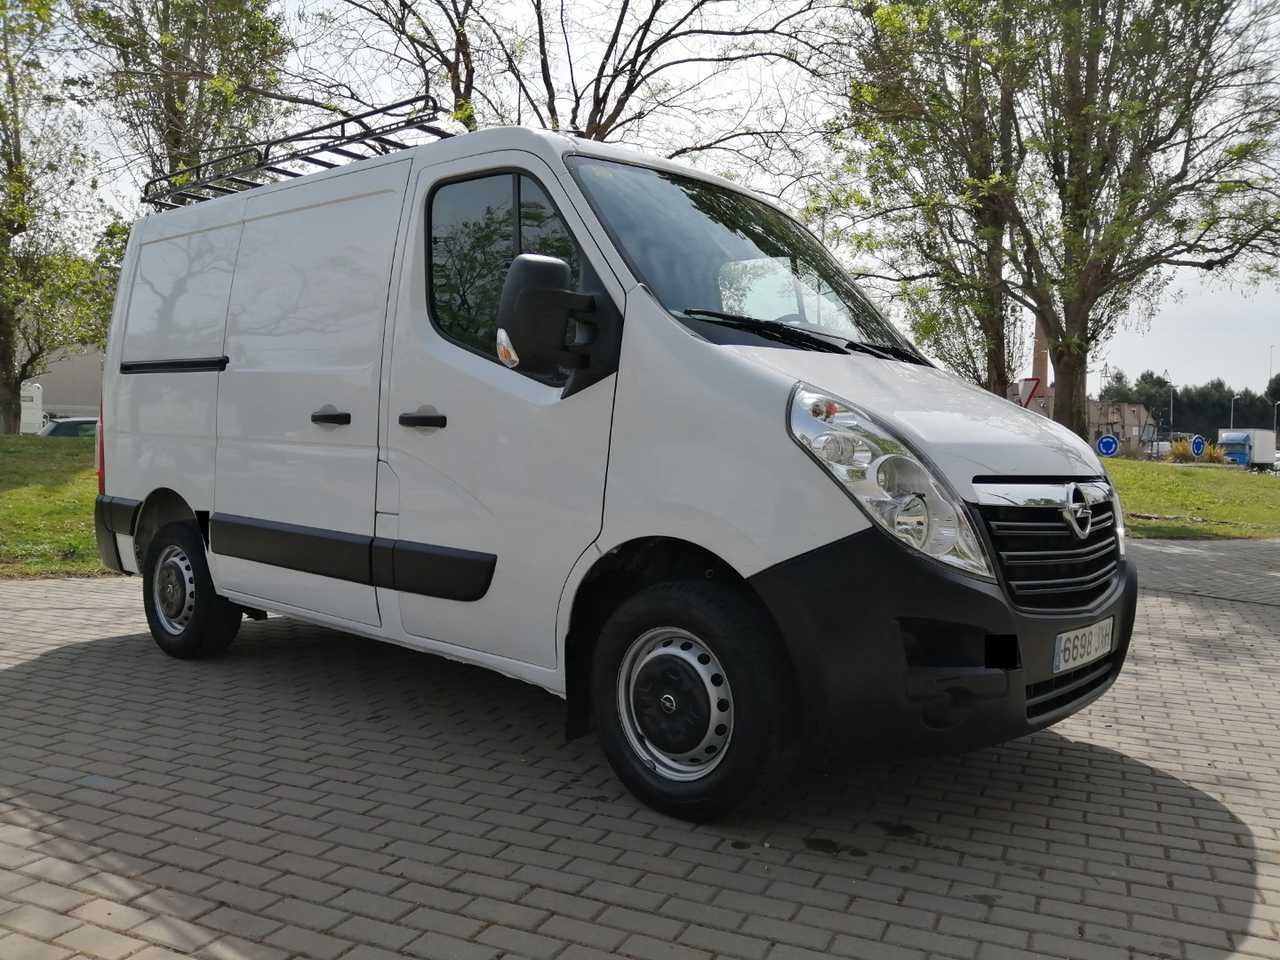 Opel Movano 2.3 CDTI 130CV L1H1 3.5T   - Foto 1